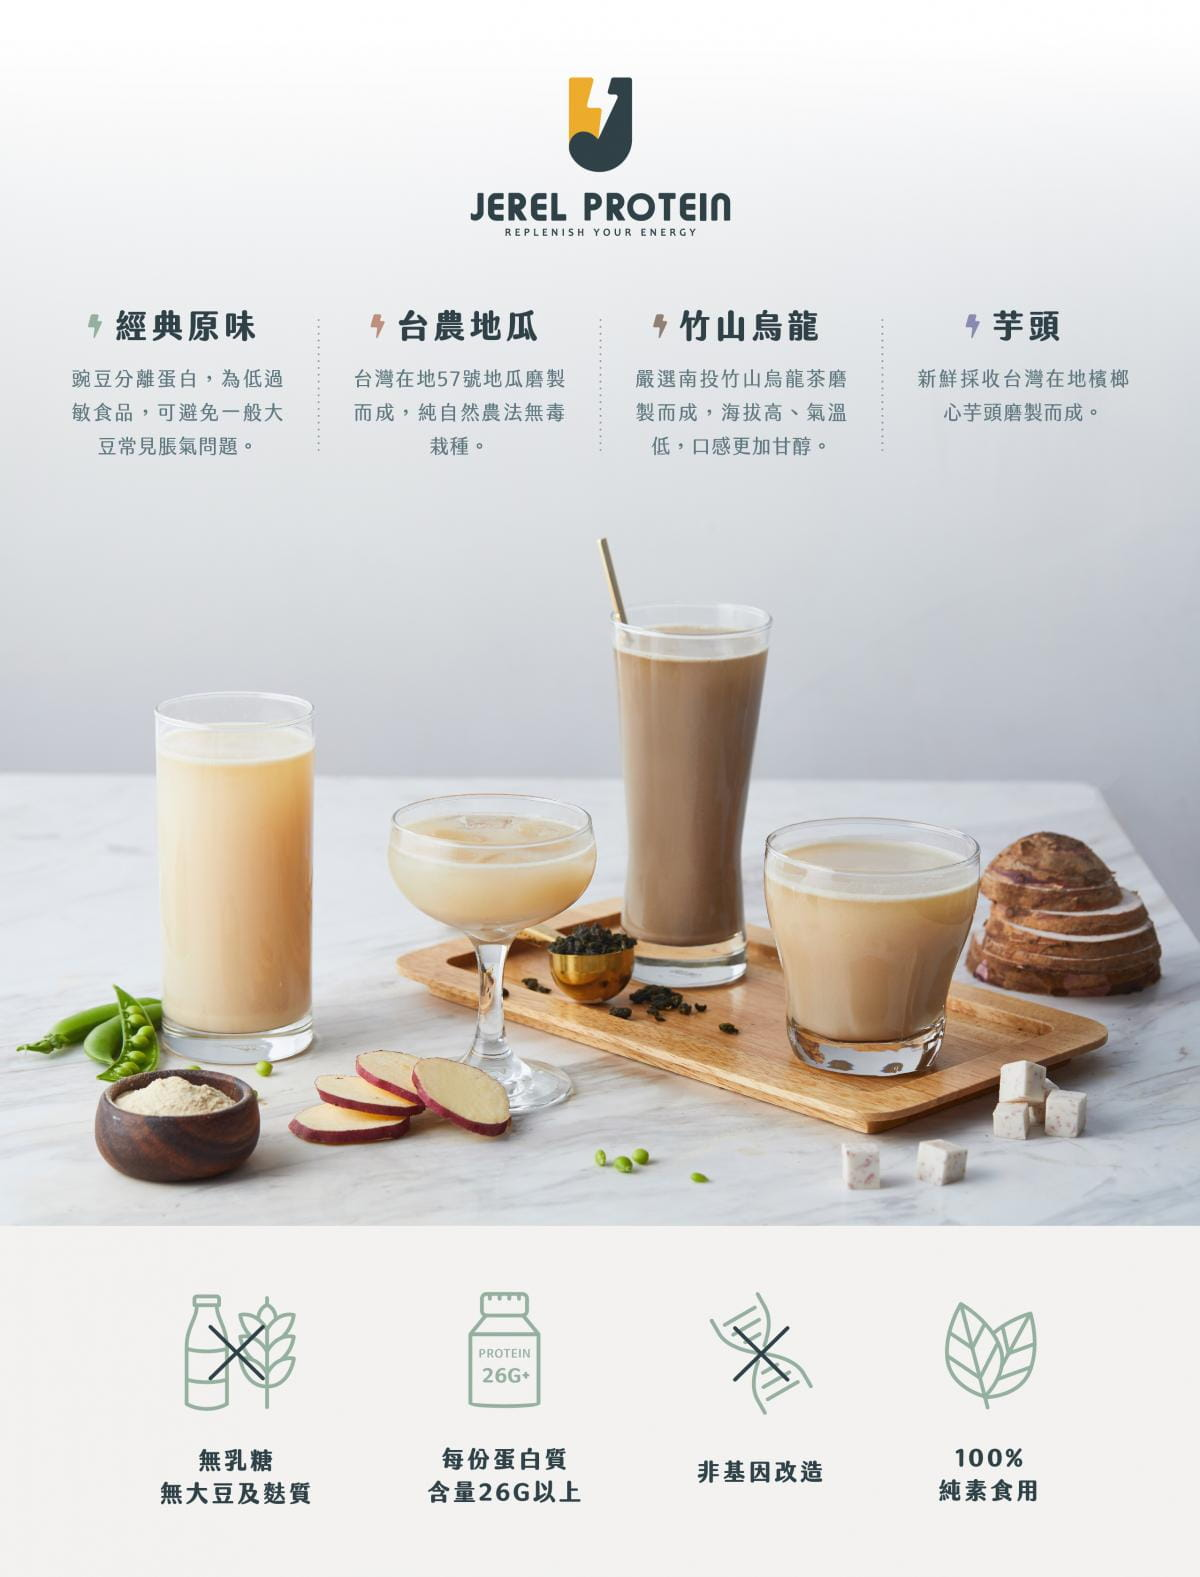 【Jerel Protein 捷銳蛋白】【Jerel Protein】捷銳蛋白-植物性豌豆分離蛋白 15包/盒 (35g*15) 1